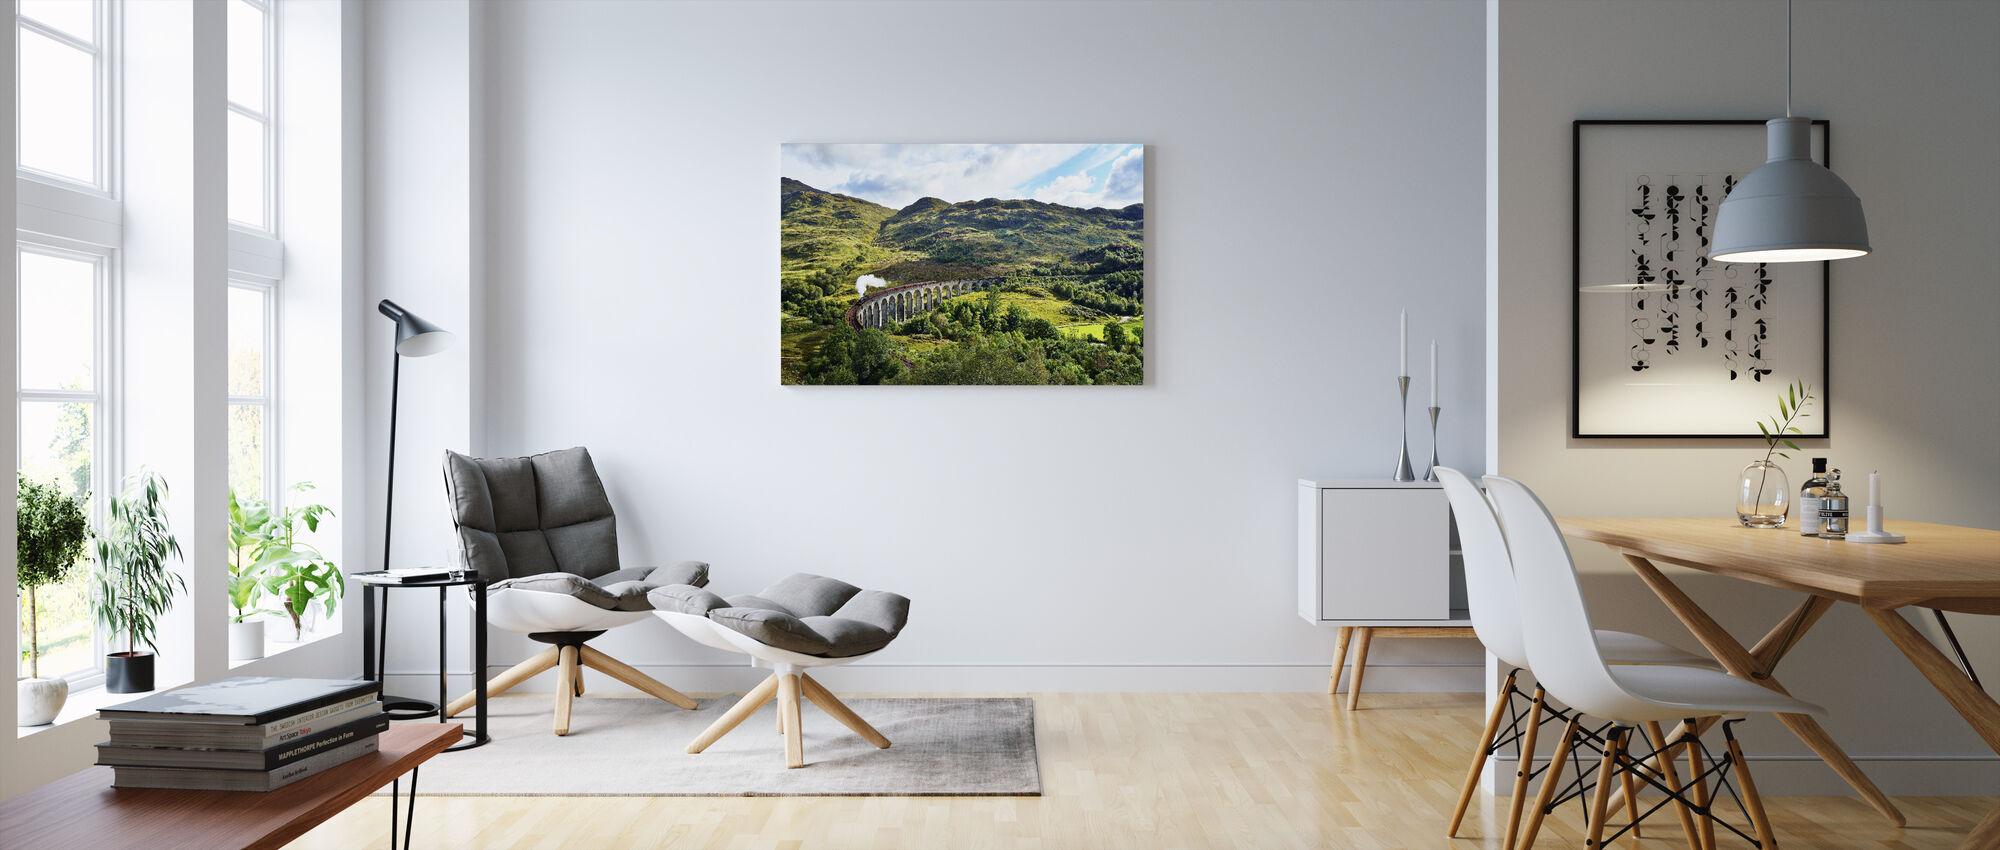 Tåg vid Skottland Highlands - Canvastavla - Vardagsrum